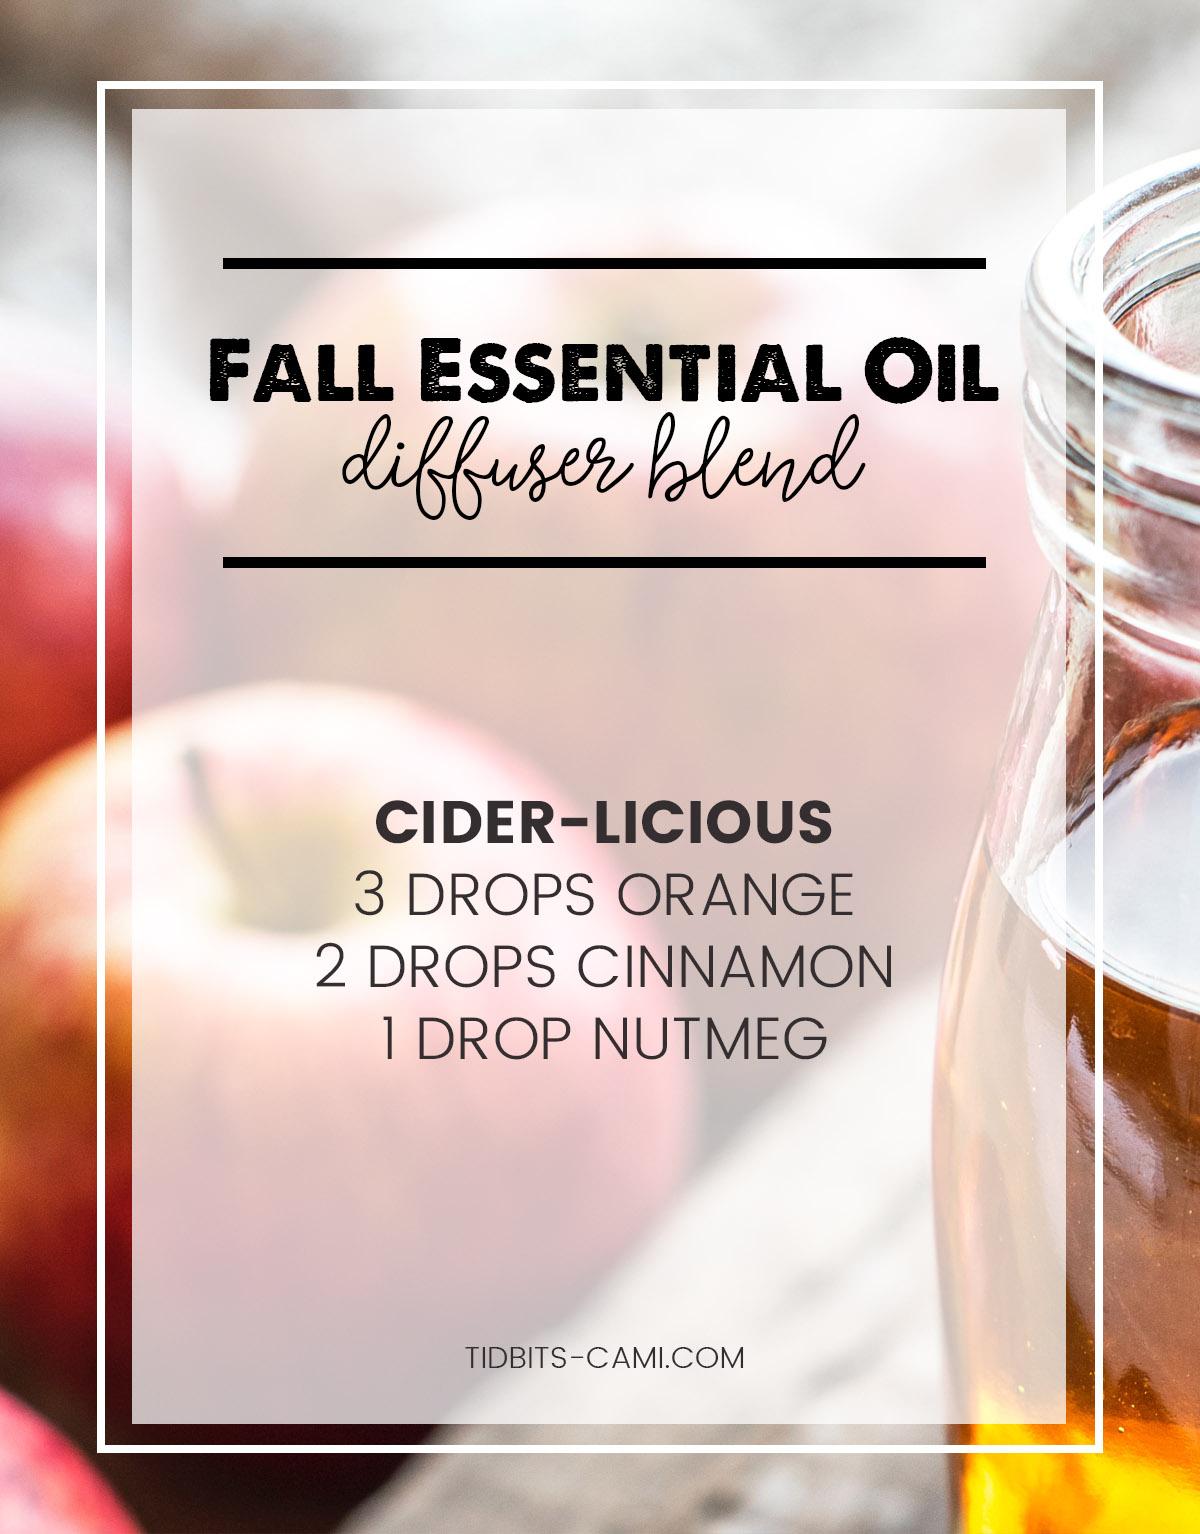 cider-licious essential oil diffuser blend